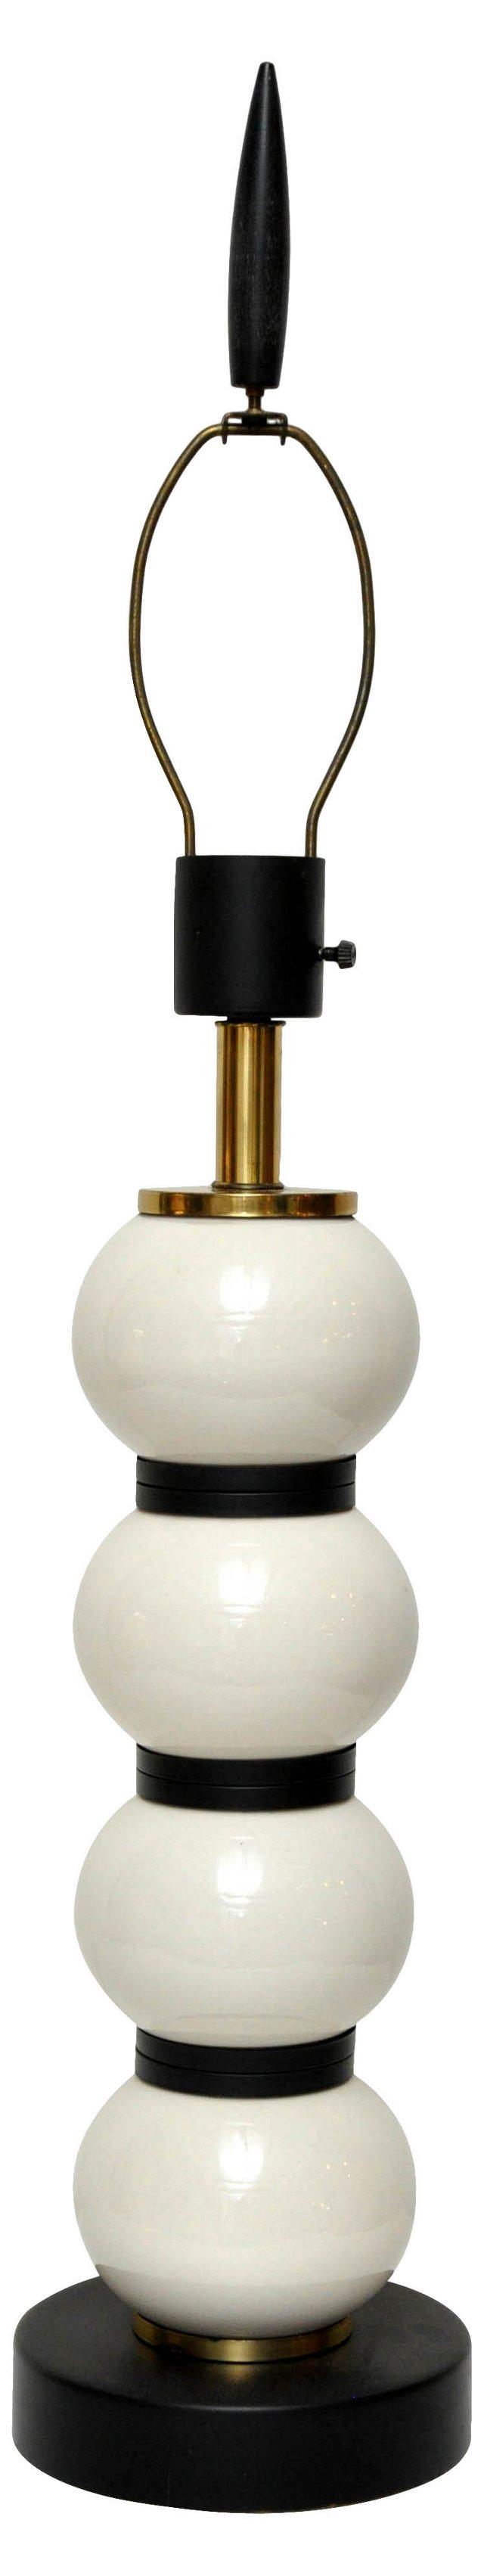 Midcentury Black & White Lamp